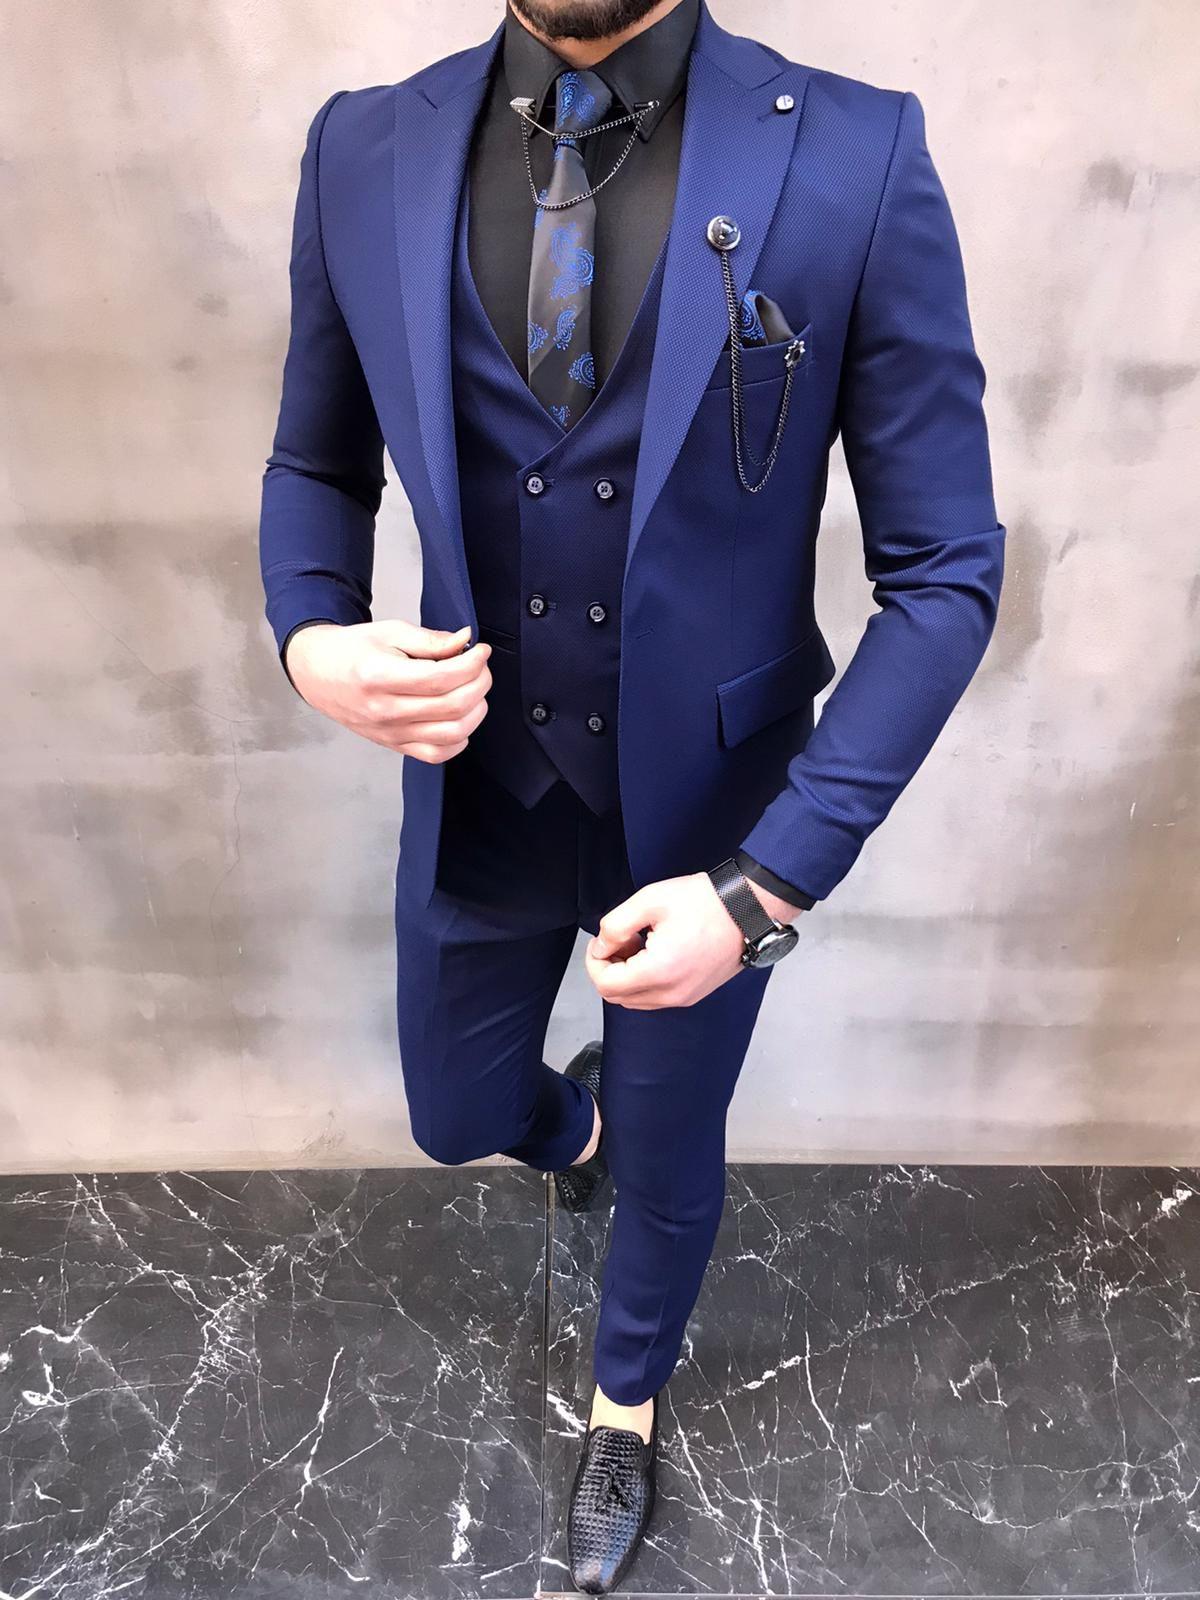 Lewes Blue Slim Fit Suit Bespoke Daily Blue Slim Fit Suit Blue Suit Men Dress Suits For Men [ 1600 x 1200 Pixel ]